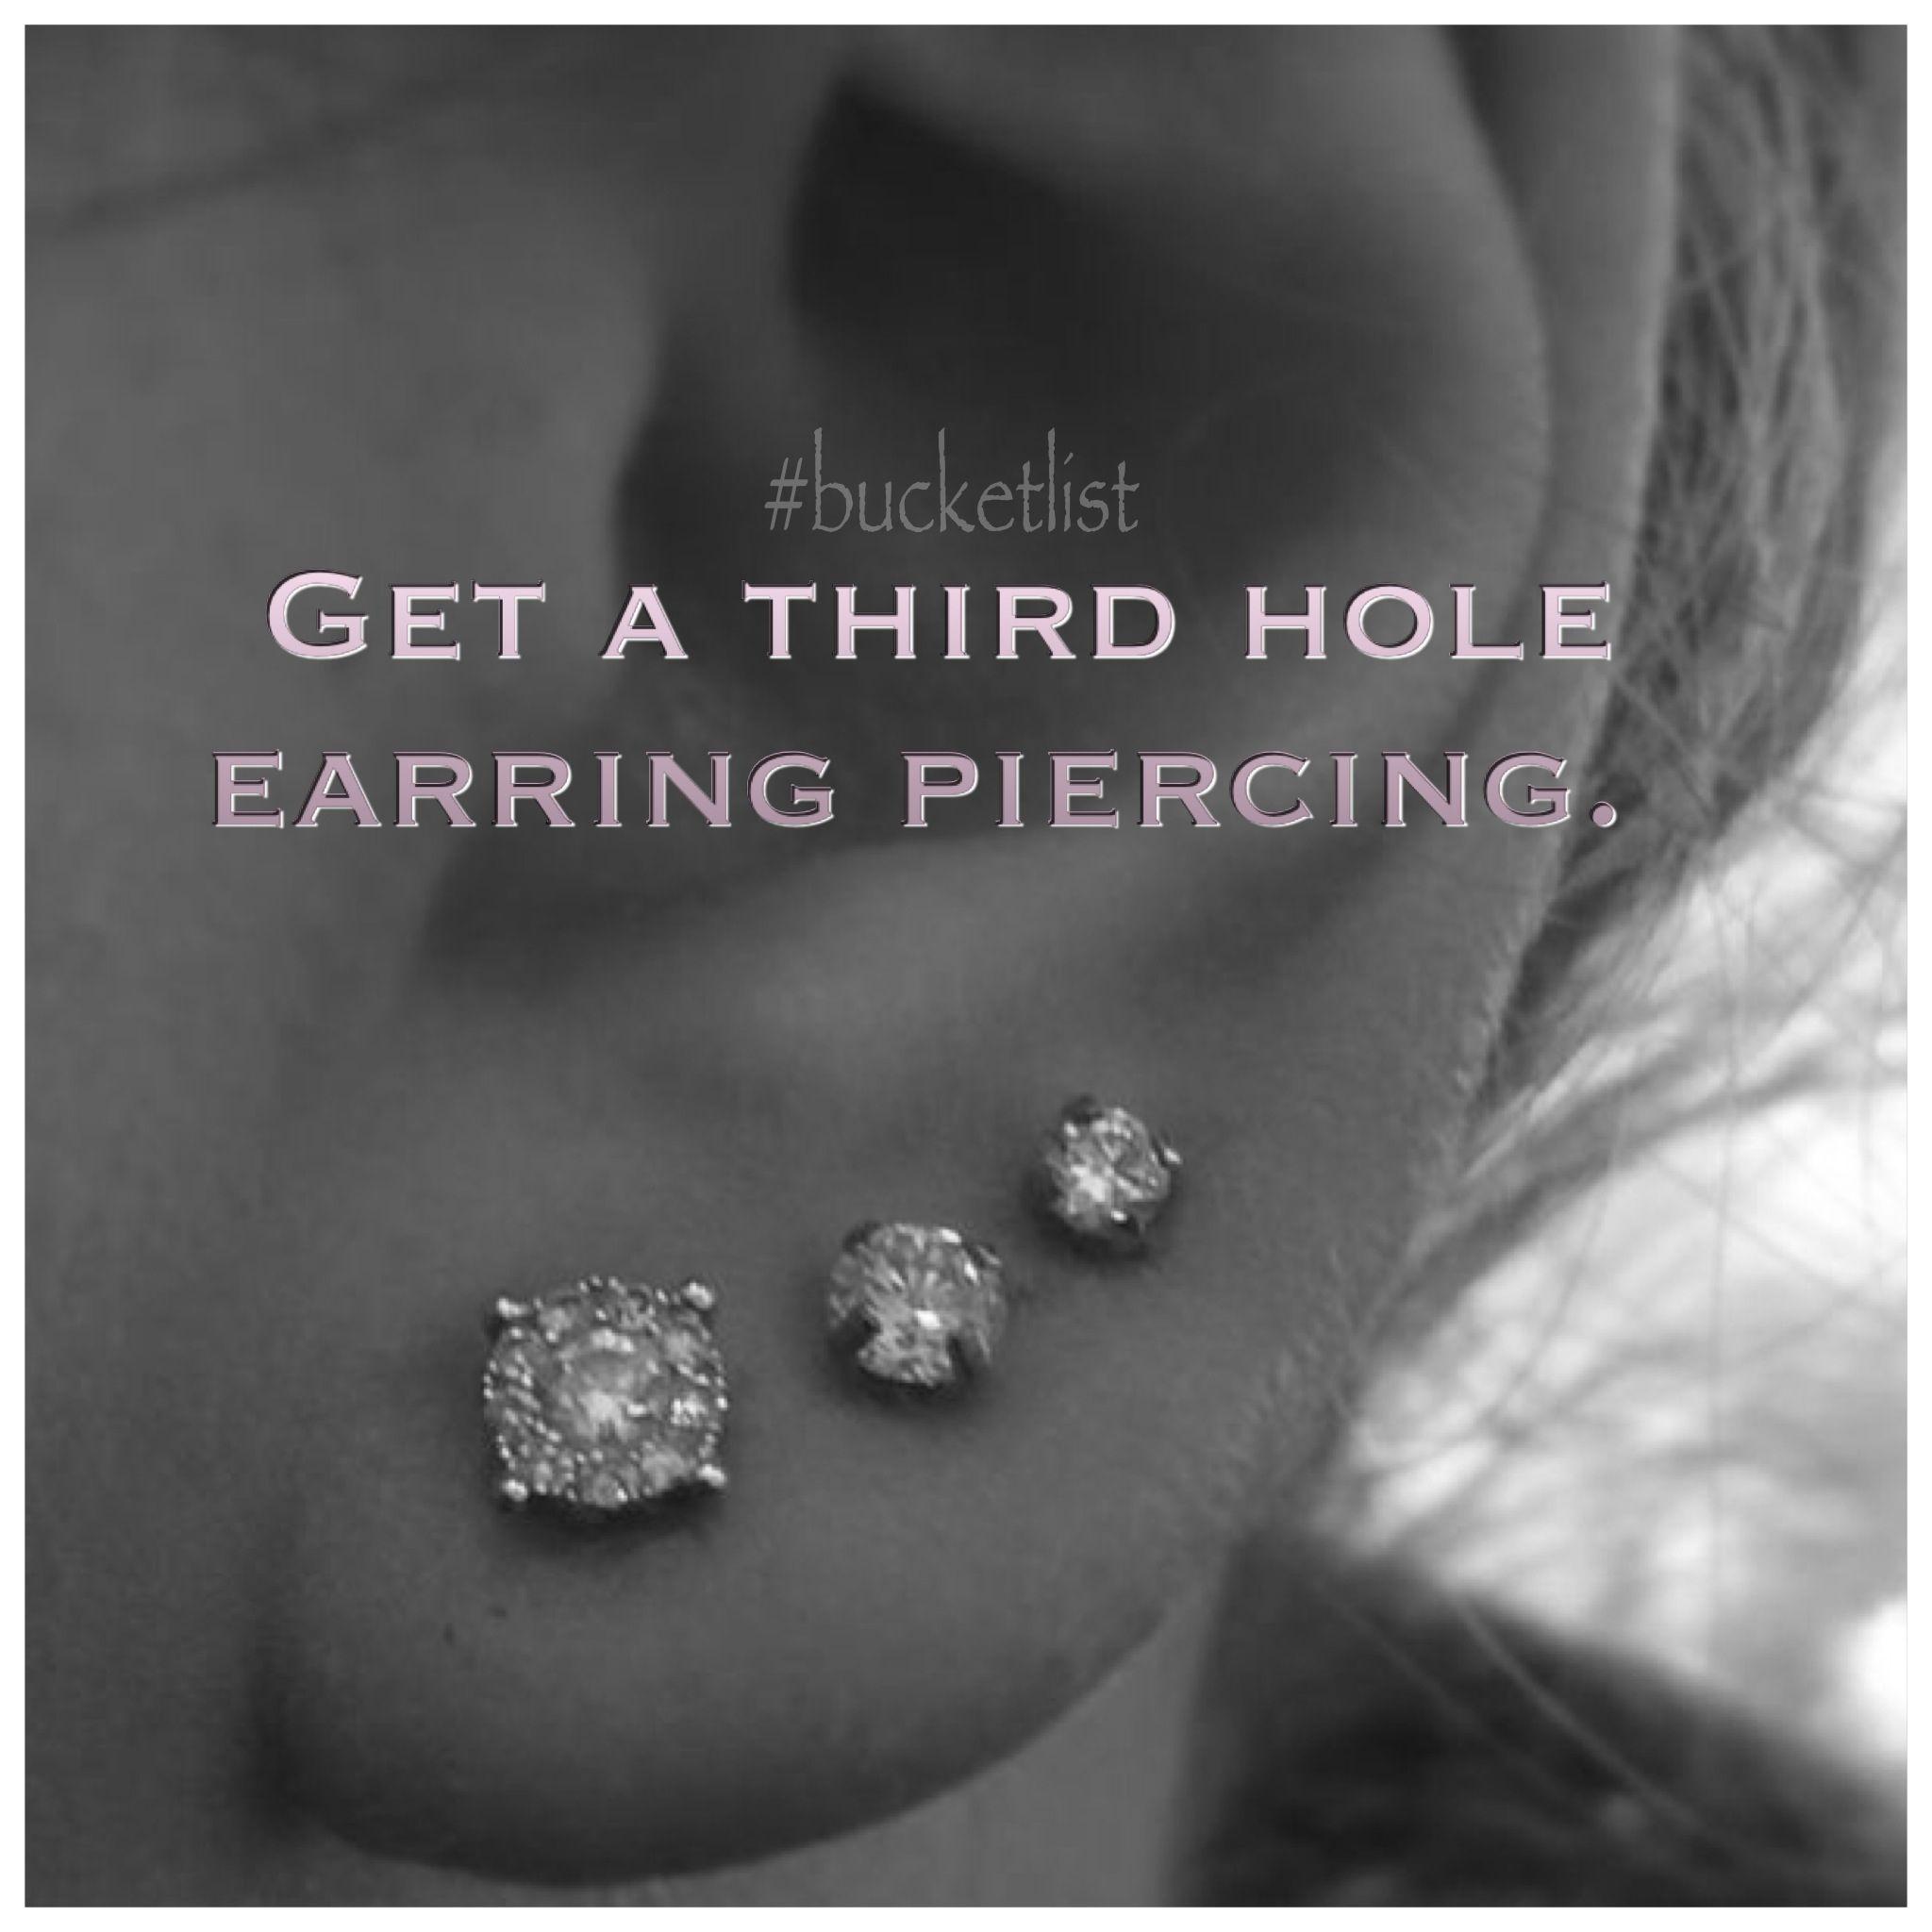 2nd ear piercing ideas  Done  bucketlist Third Hole earring piercing  nd hole